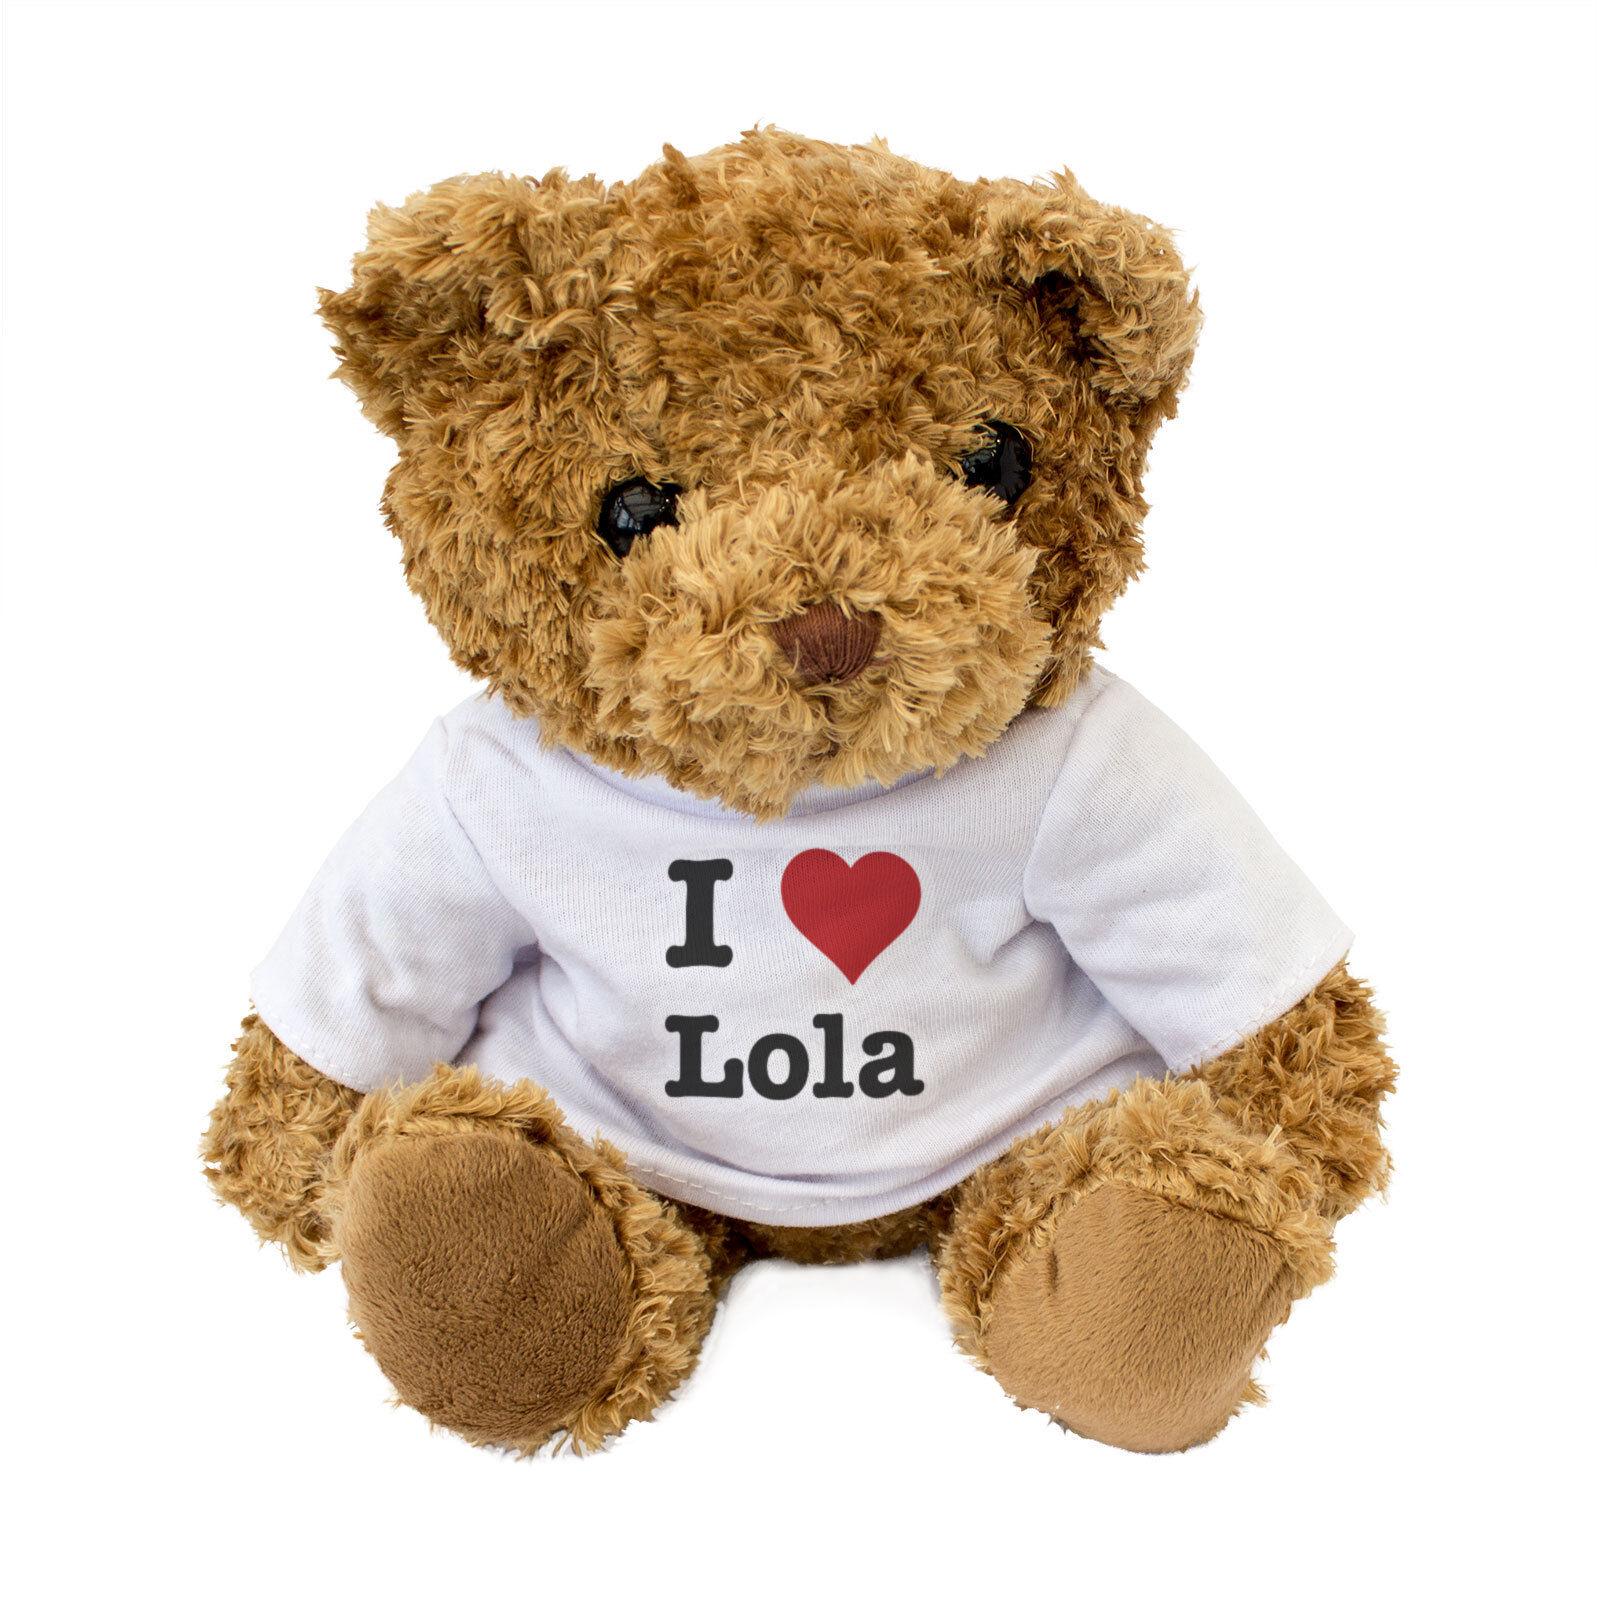 Nuevo - i Love Lola - - - Oso de Peluche Lindo Regalo Presente Cumpleaños Valentine a5d625